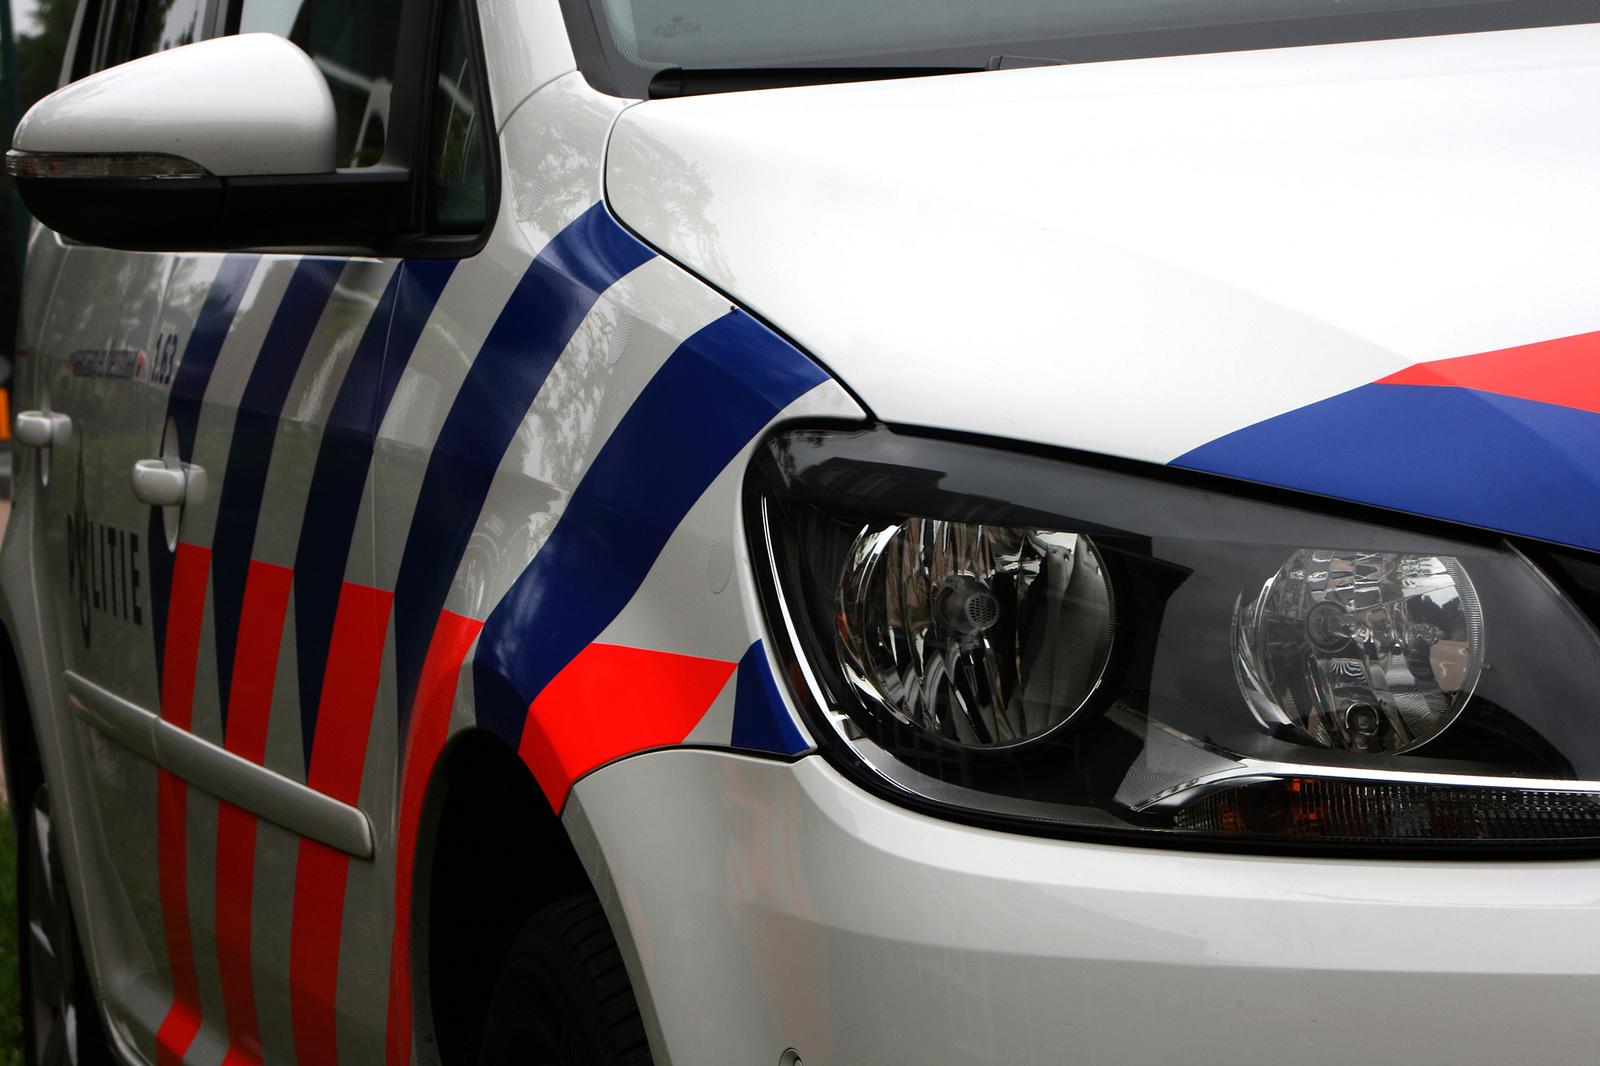 Jongen valt mensen lastig in Hoorn: slachtoffers gezocht